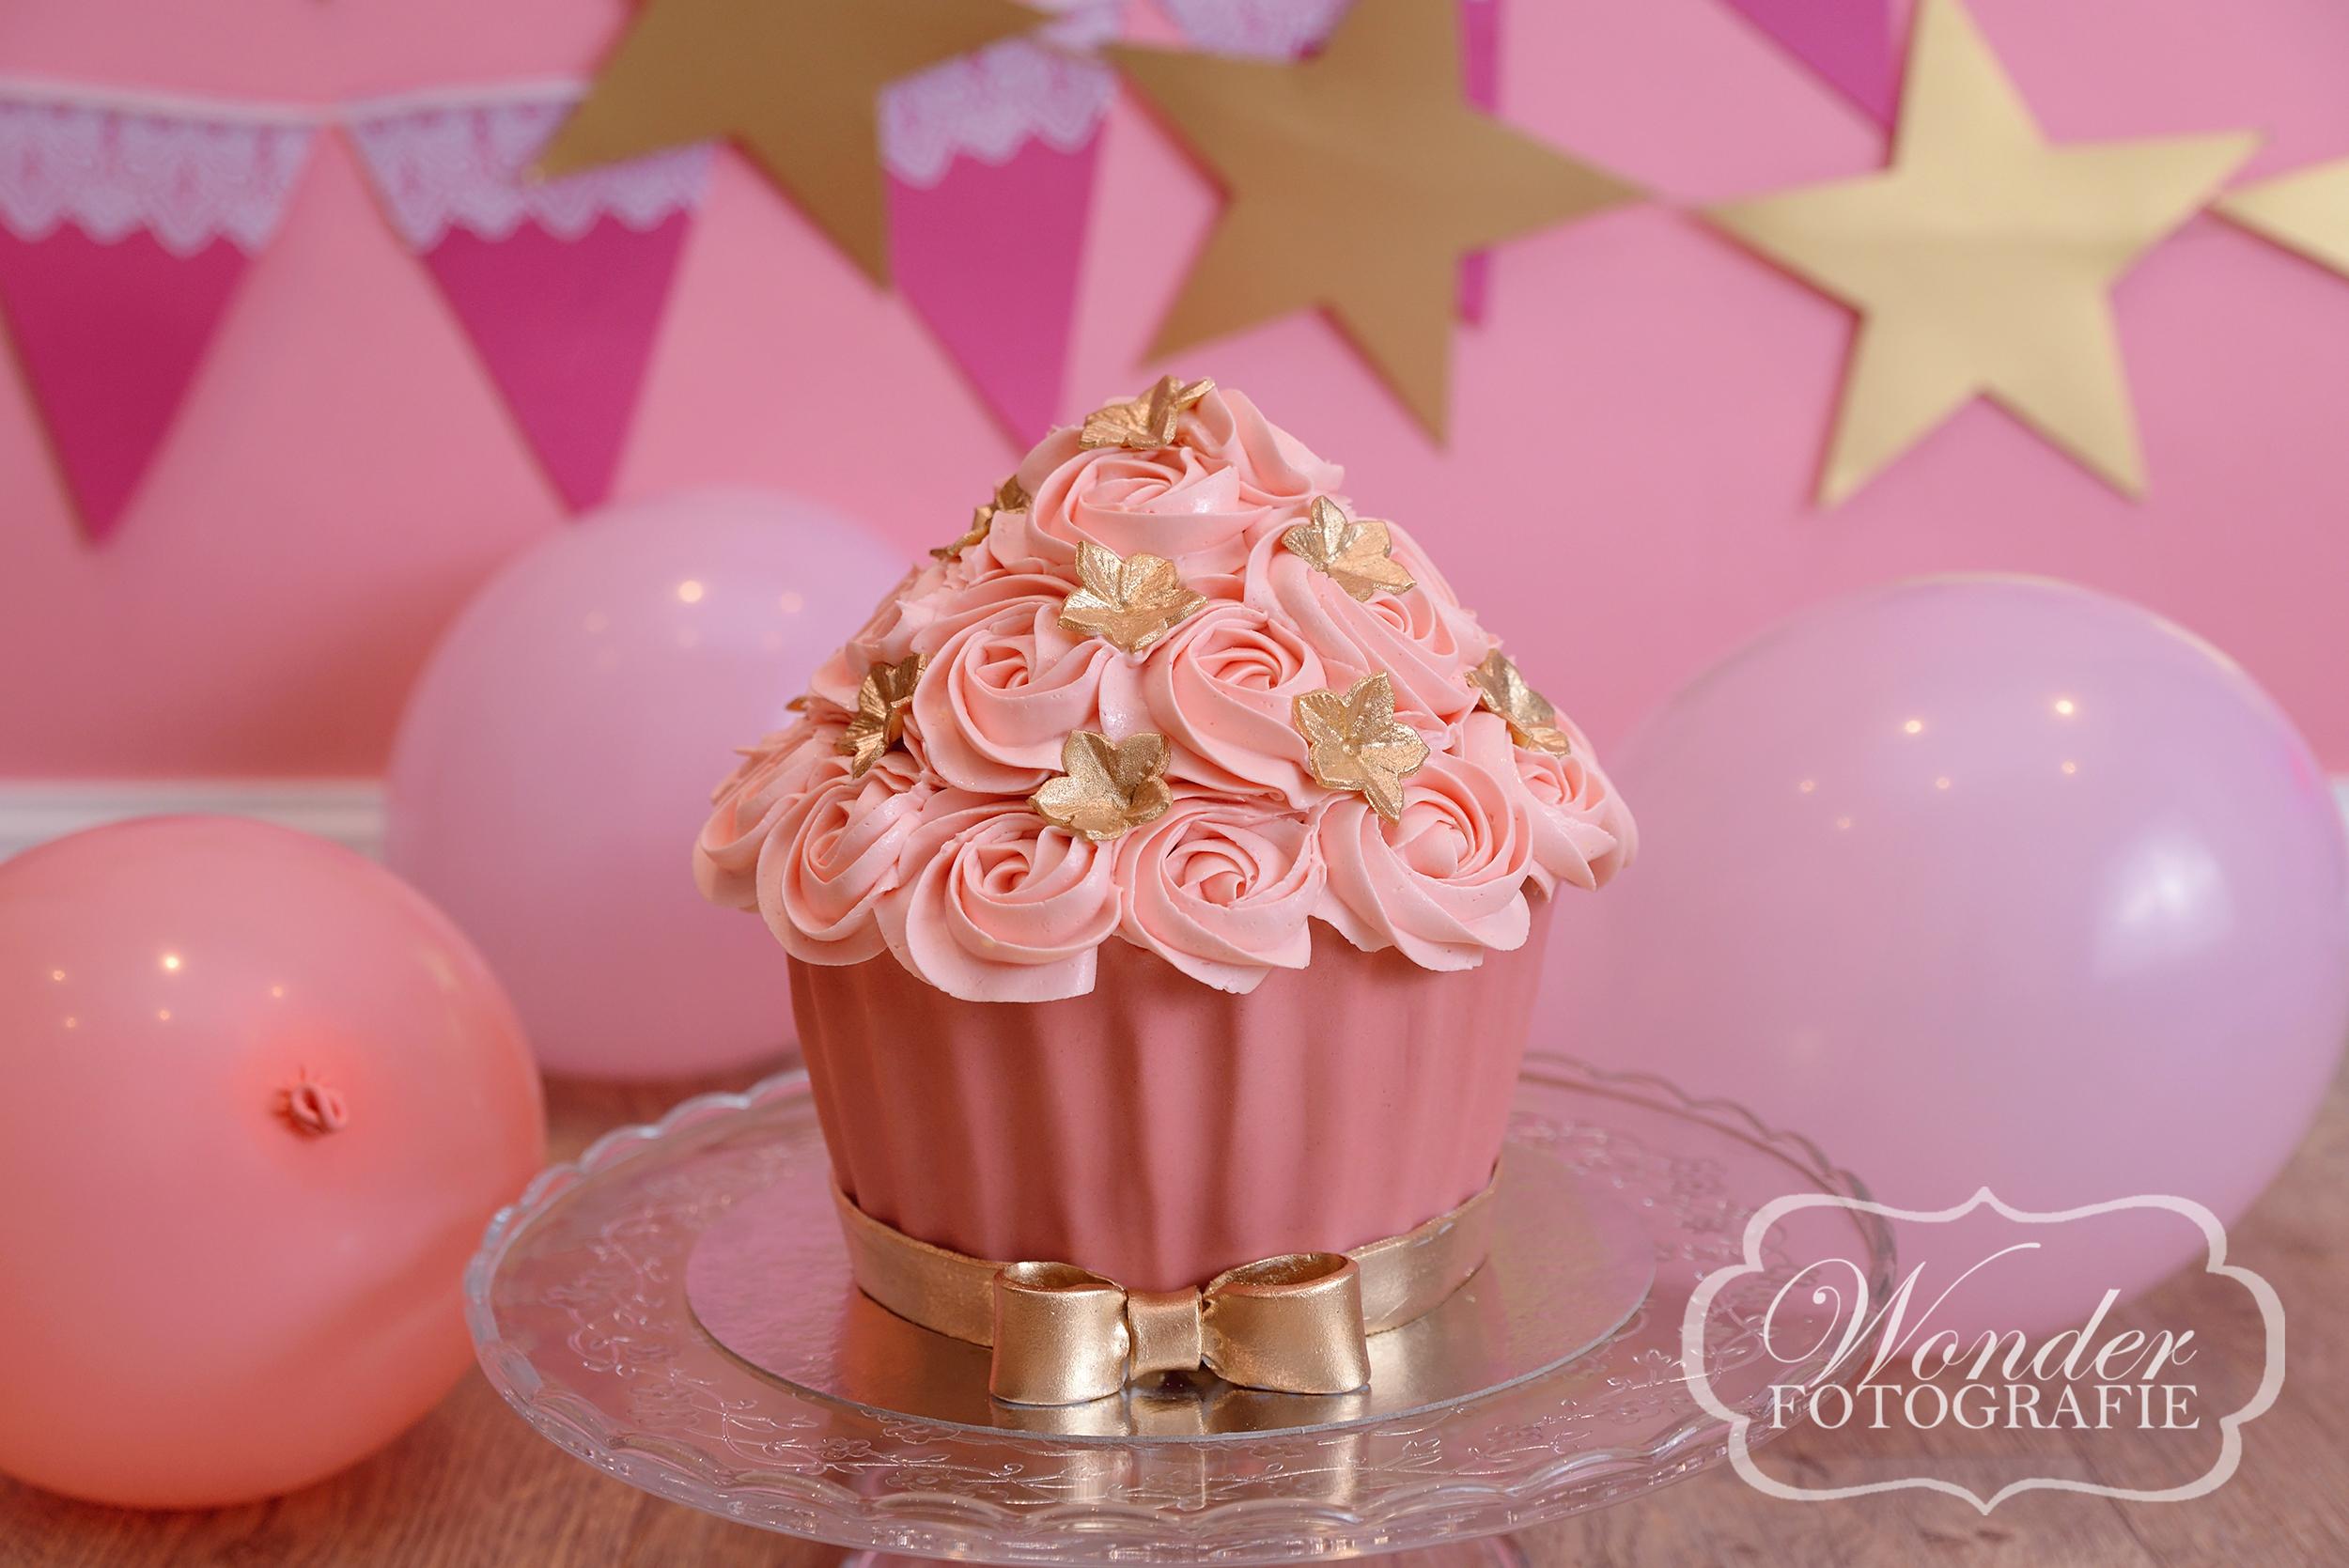 Cake Smash roze goud sterren - Wonder Fotografie